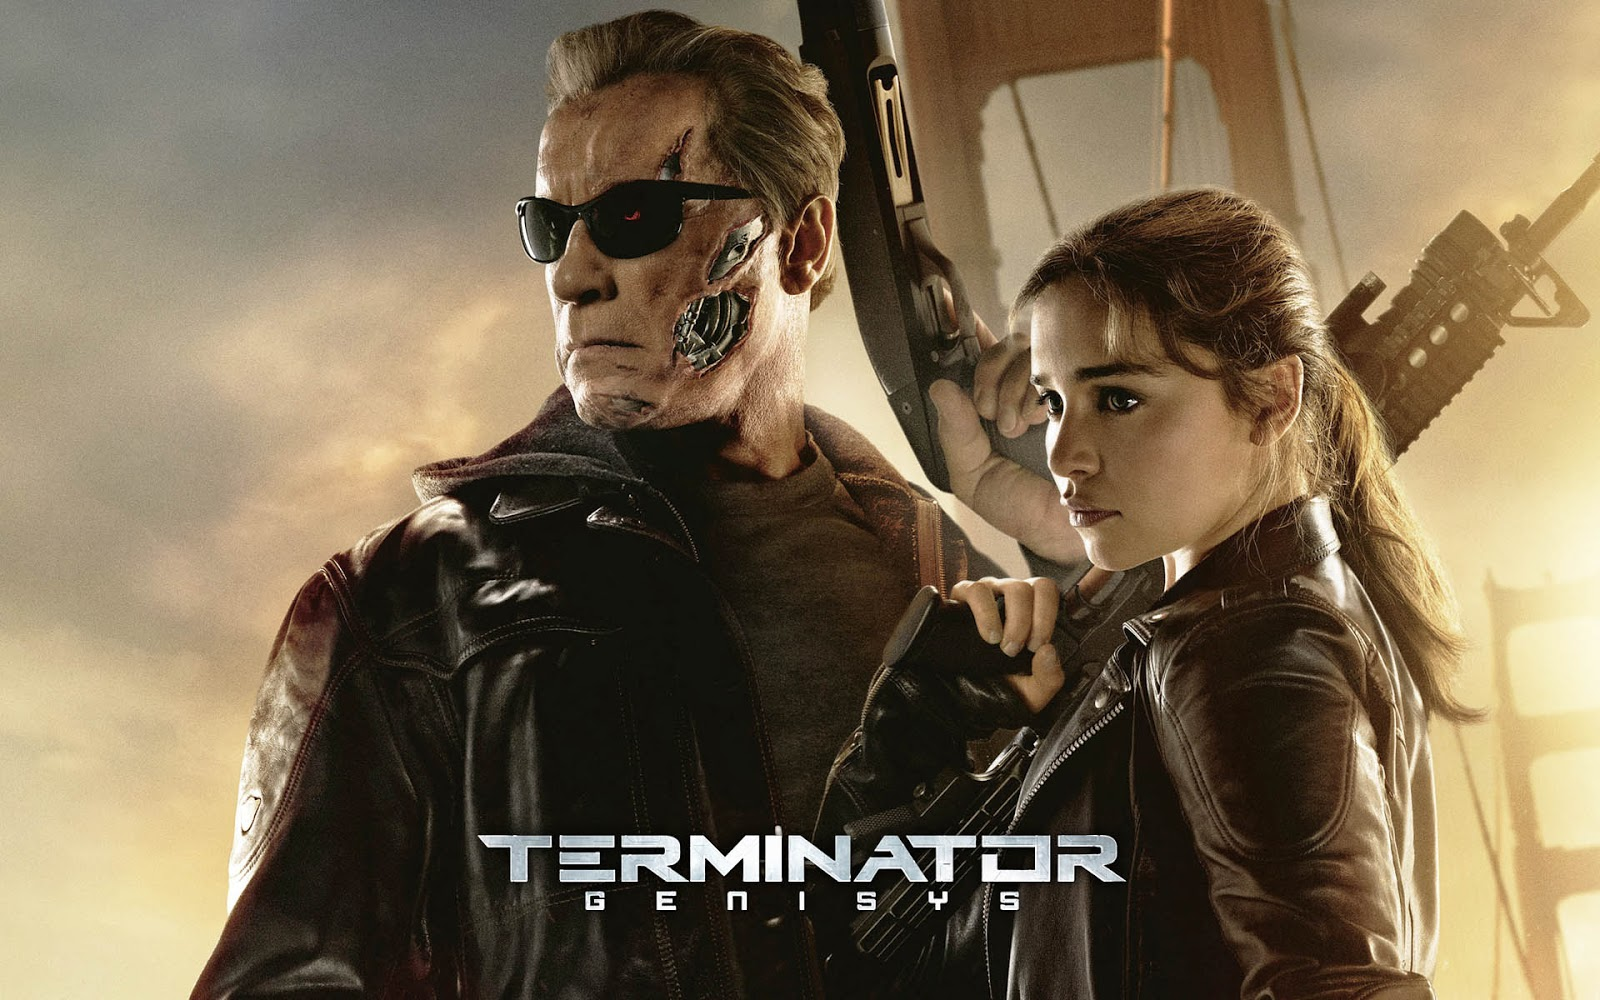 Terminator Genisys wallpapers Movie HQ Terminator Genisys 1600x1000